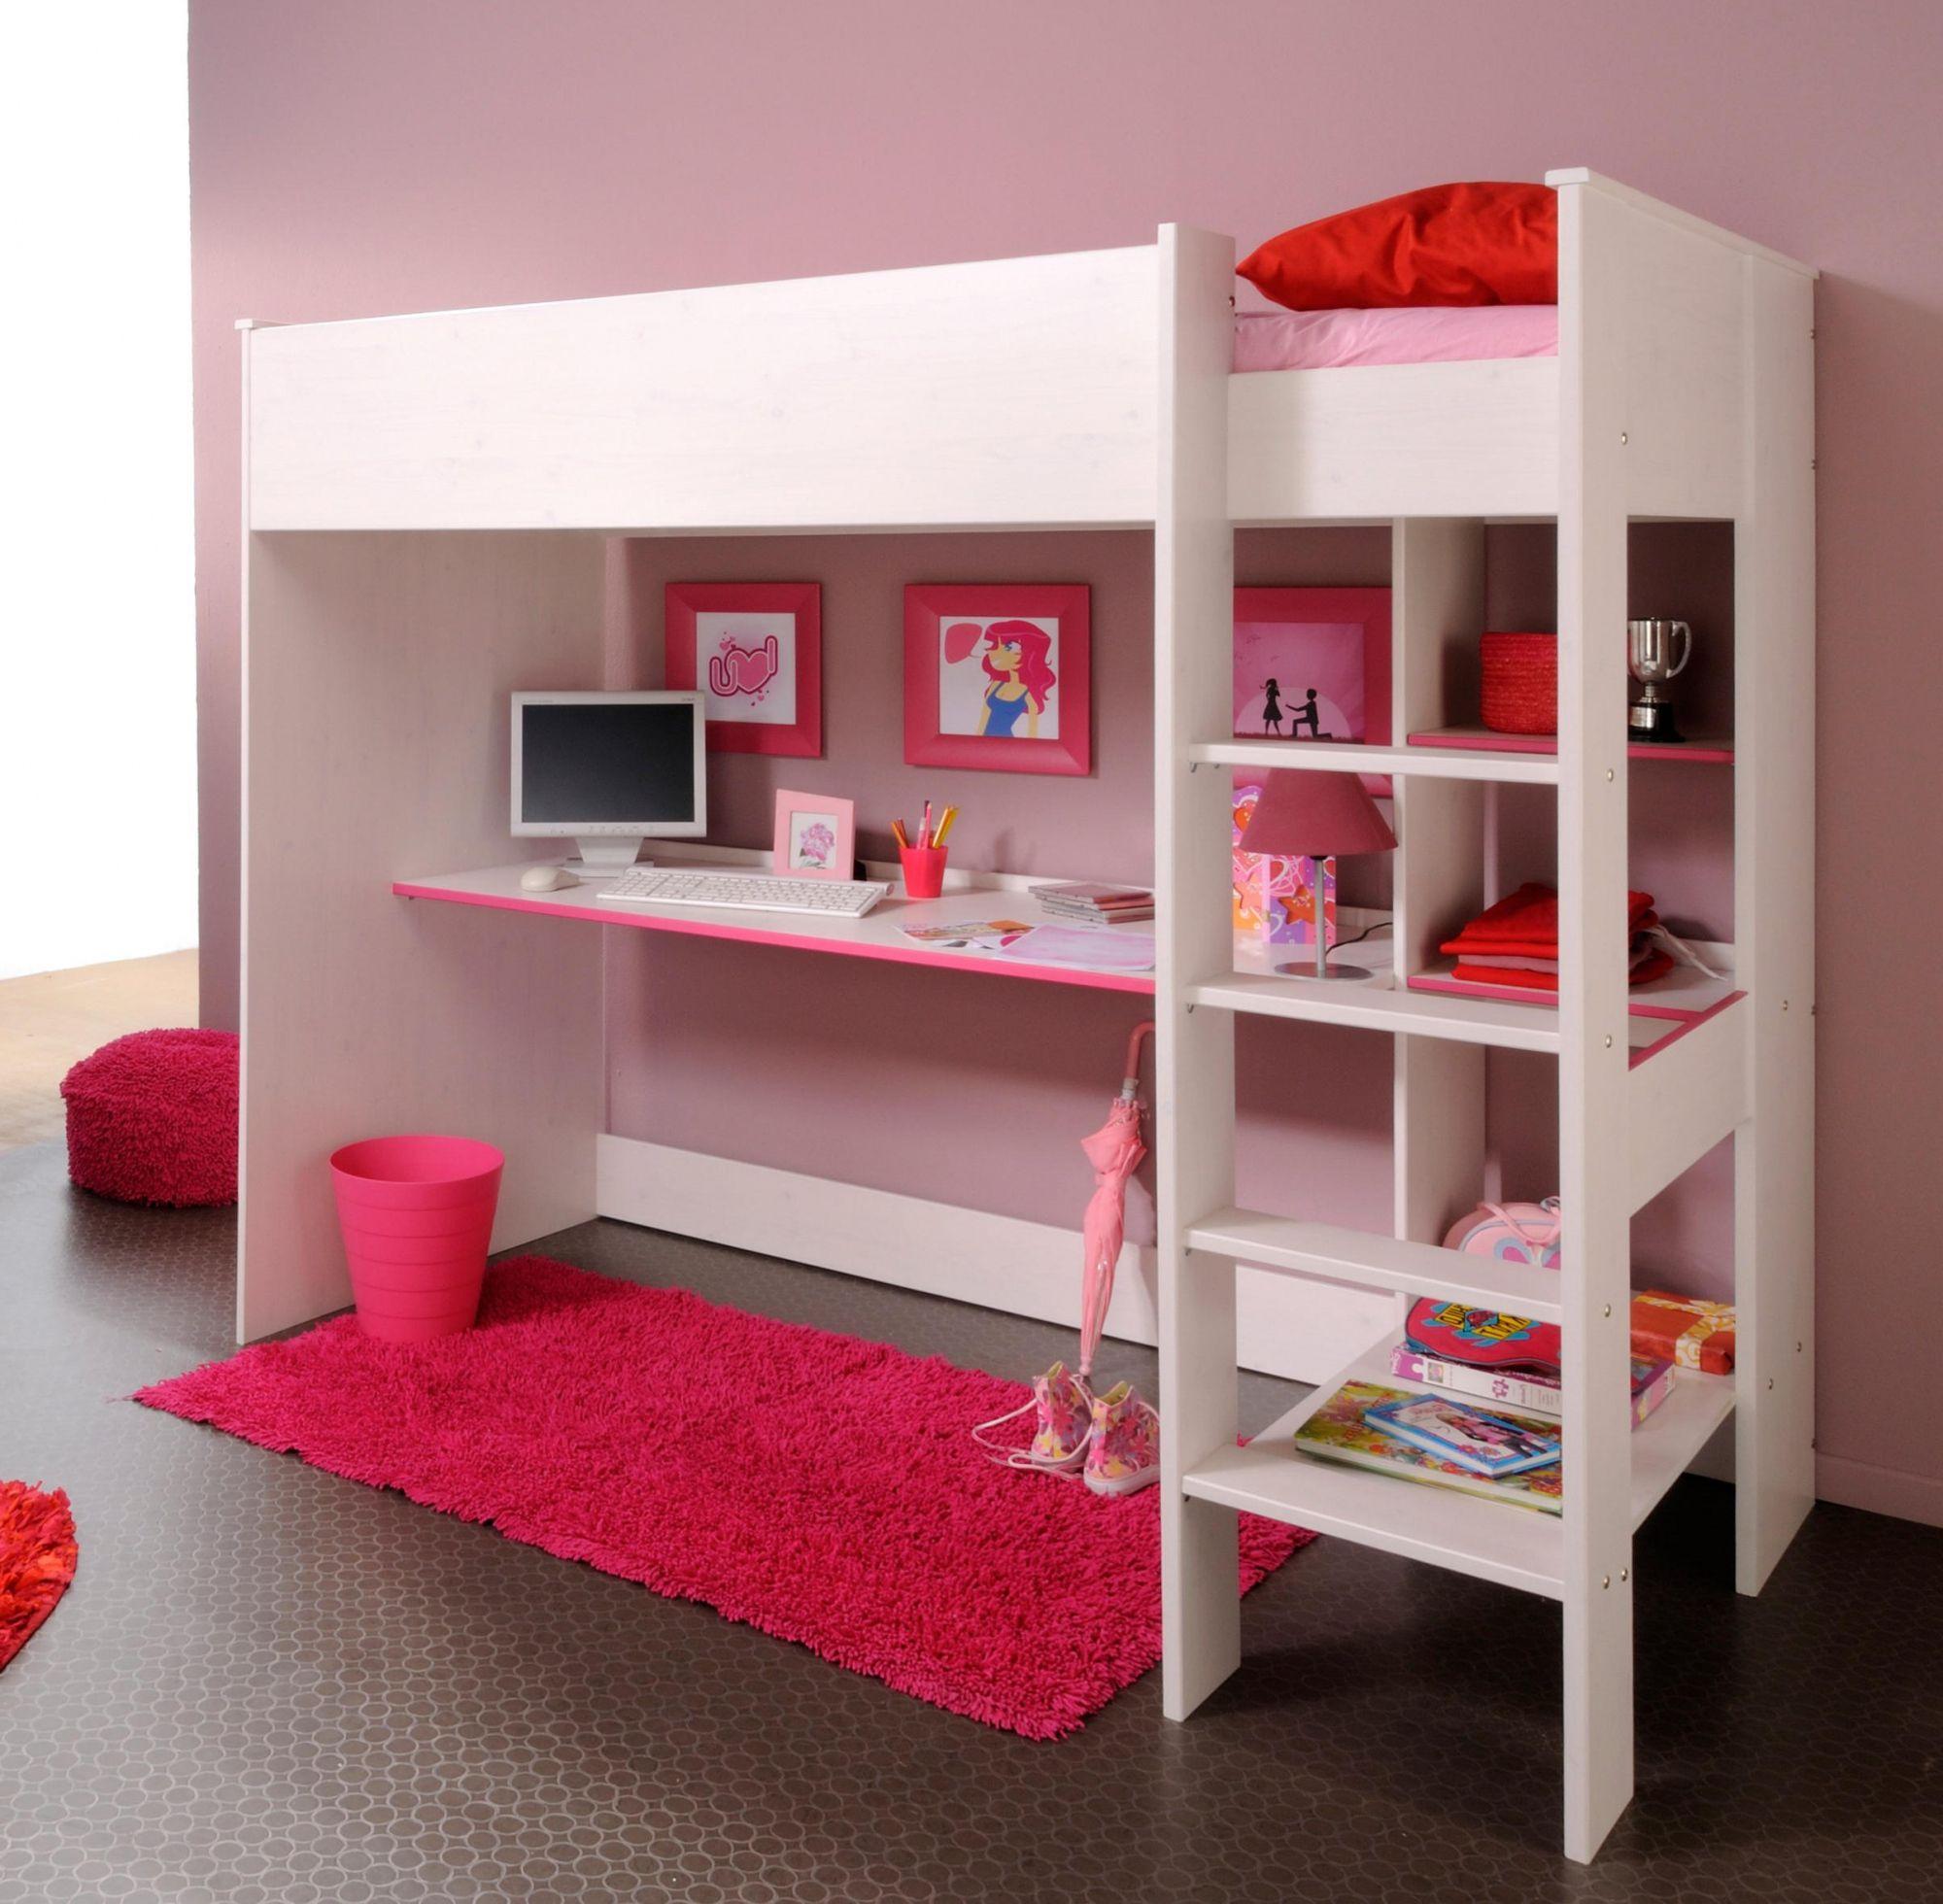 Loft Bed With Desk Underneath Ikea Diy Corner Desk Ideas Check More At Http Www Gameintown Com Loft Bed Bunk Bed With Desk Ikea Bunk Bed Girls Bedroom Sets